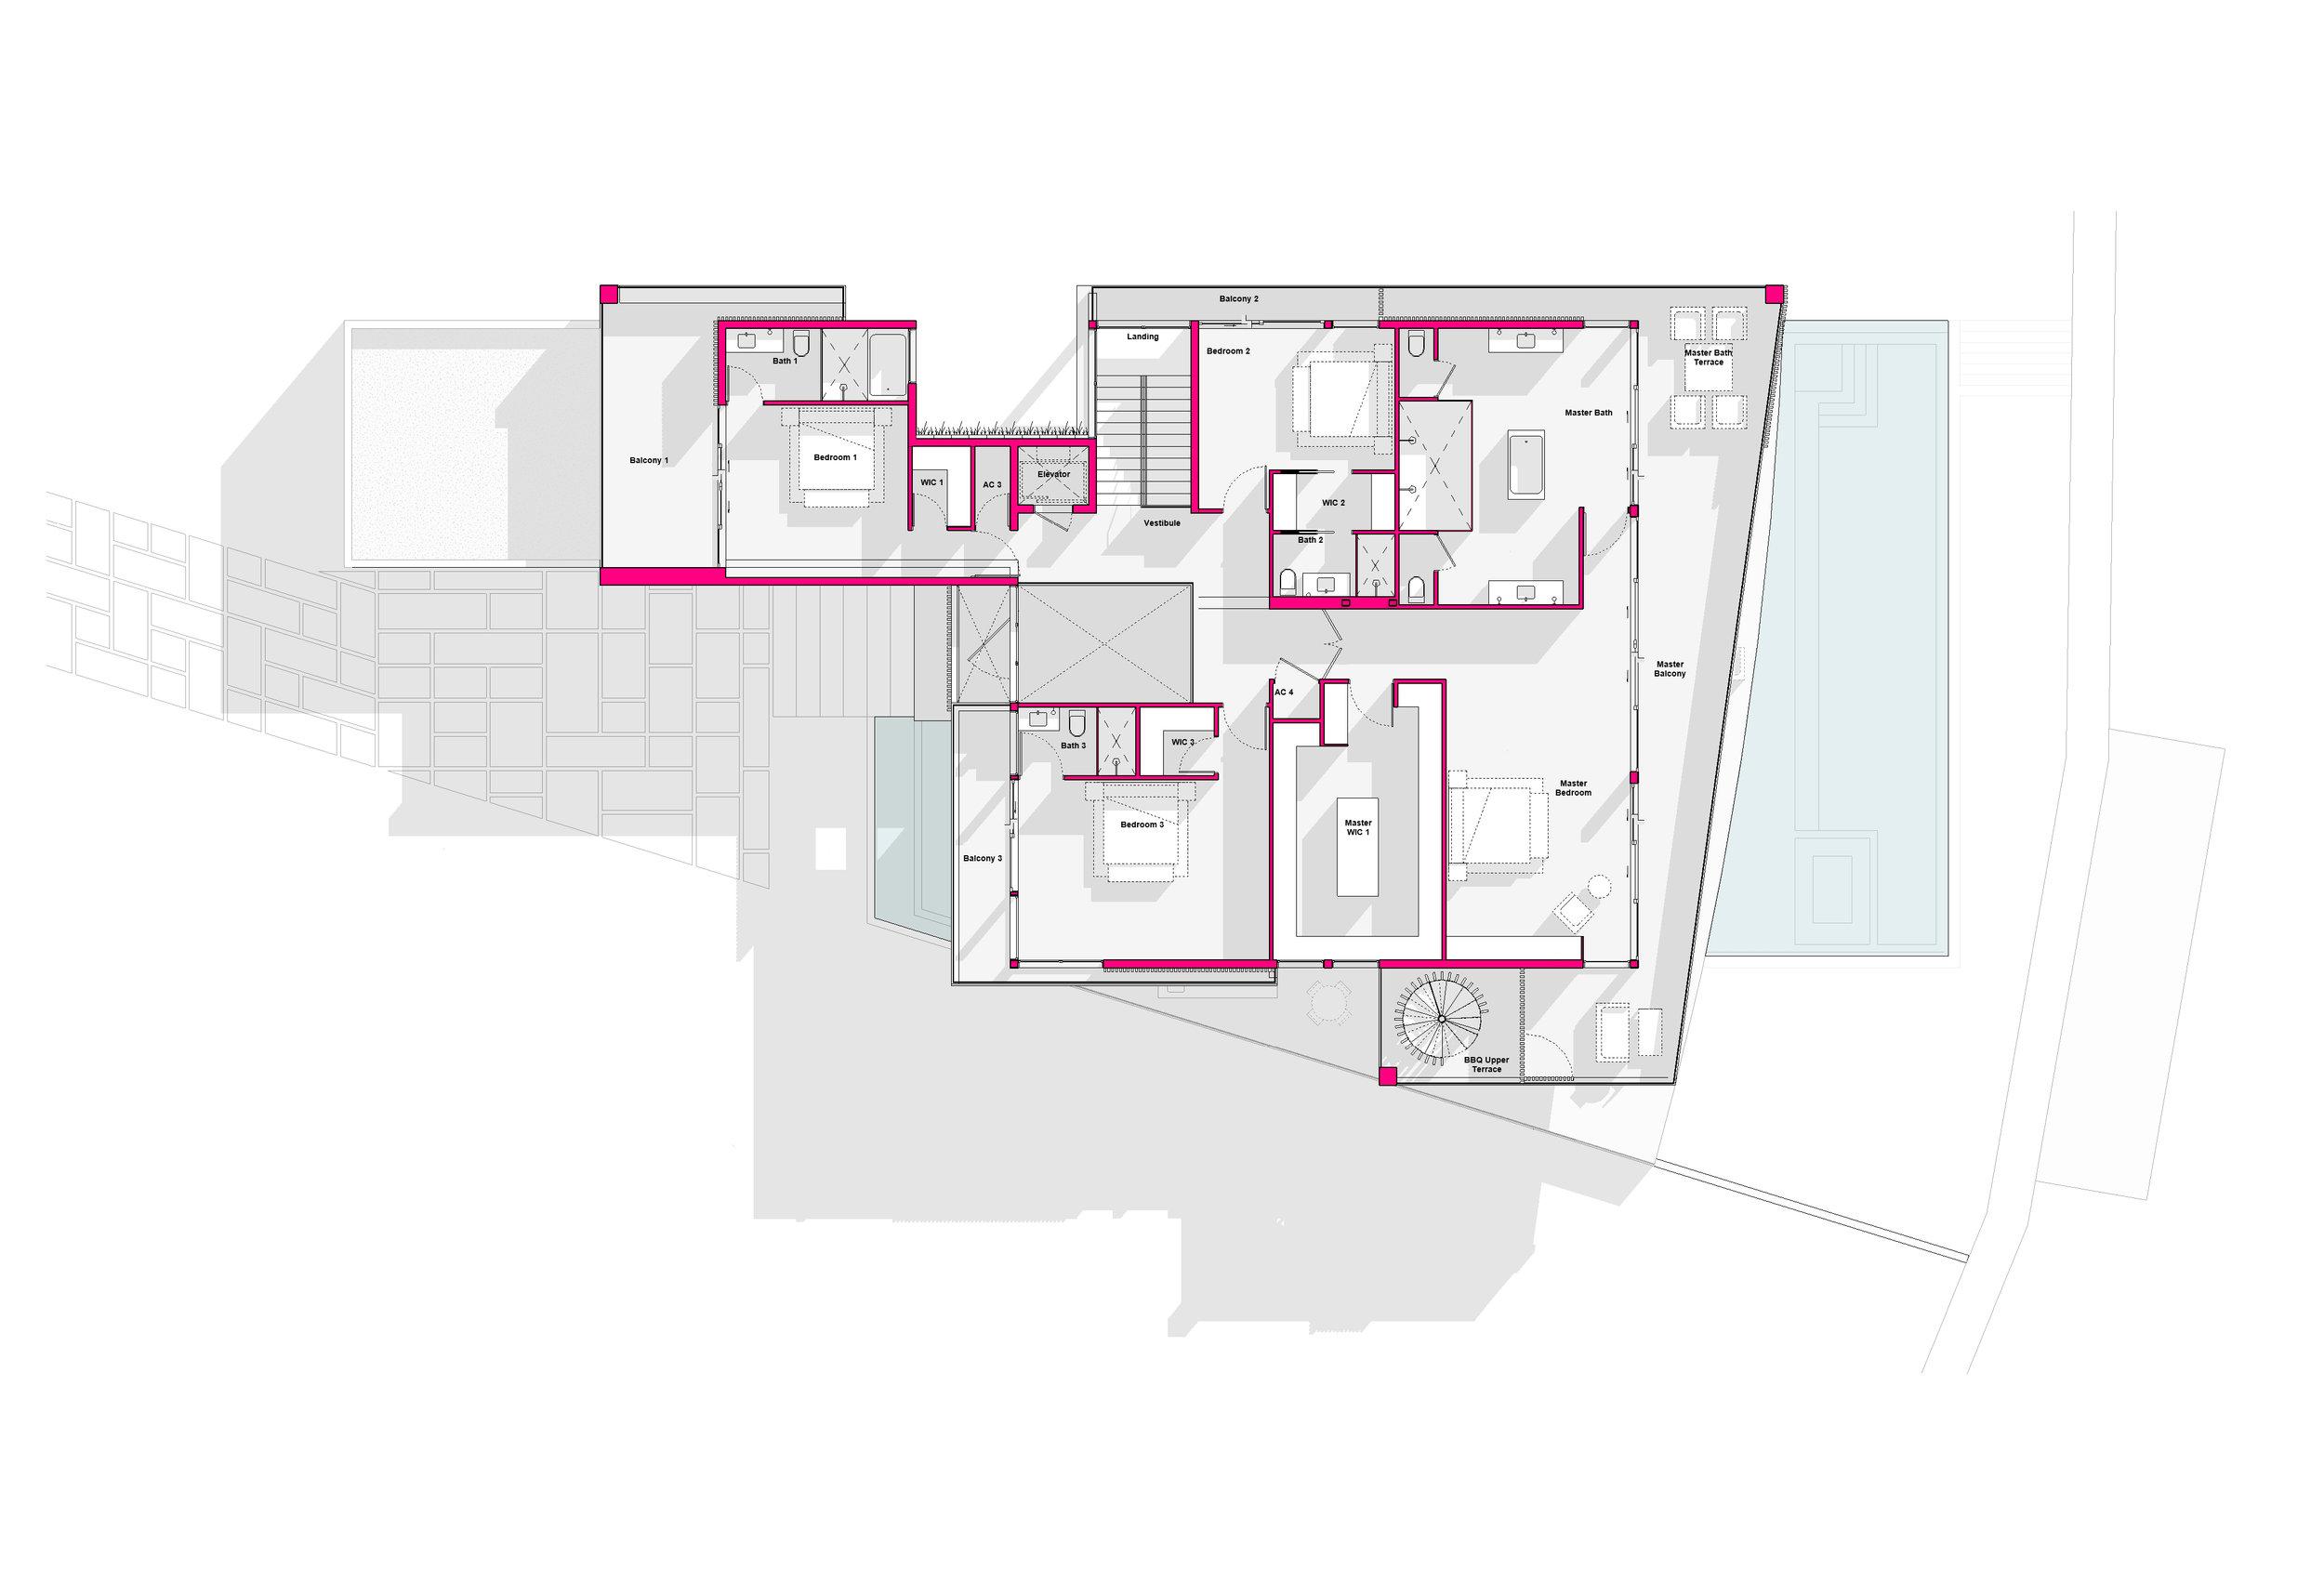 SAN MARINO - Sheet - X2 - Second Floor Plan.jpg